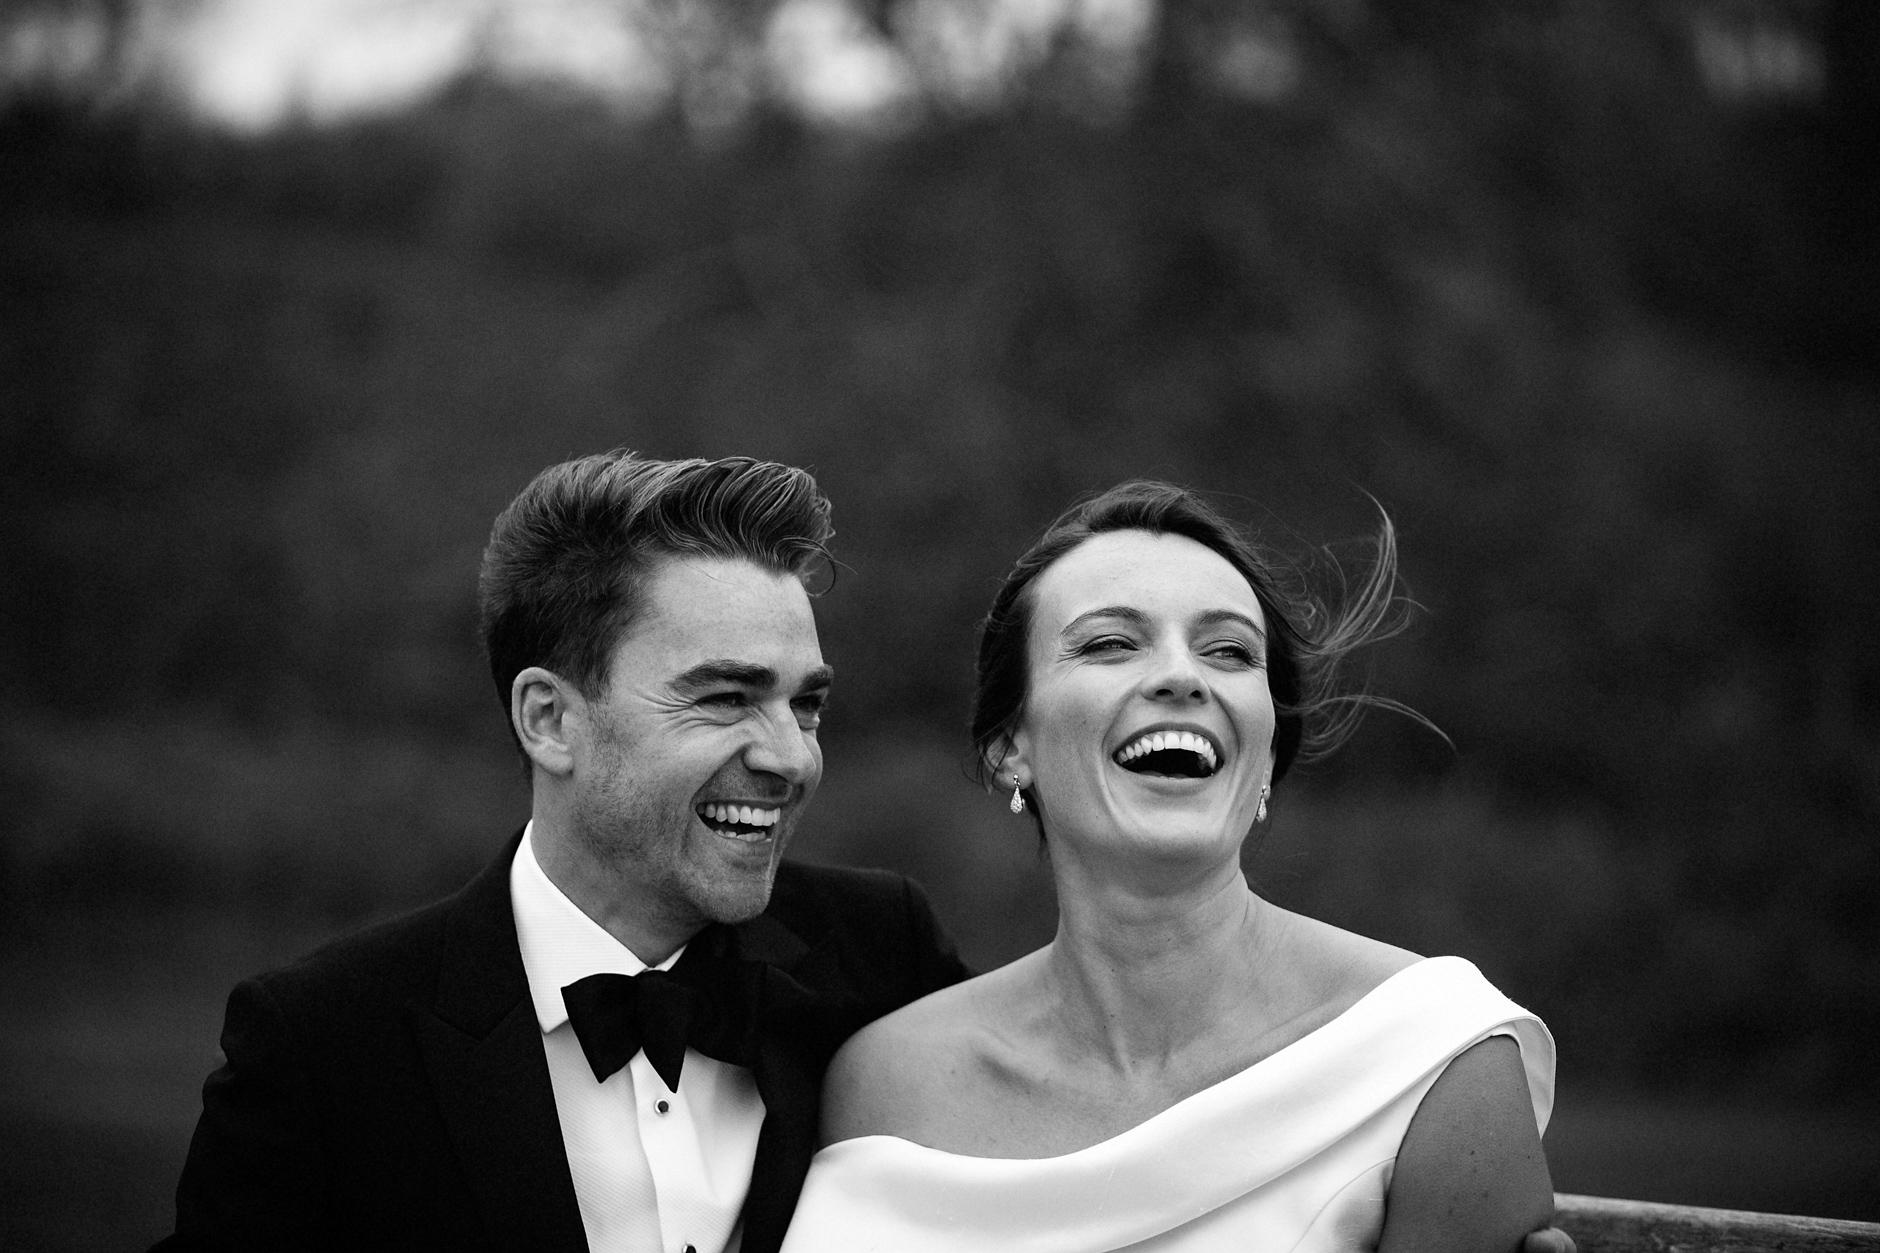 Glentruim-Wedding-Nikki-Leadbetter-Photography-206.jpg